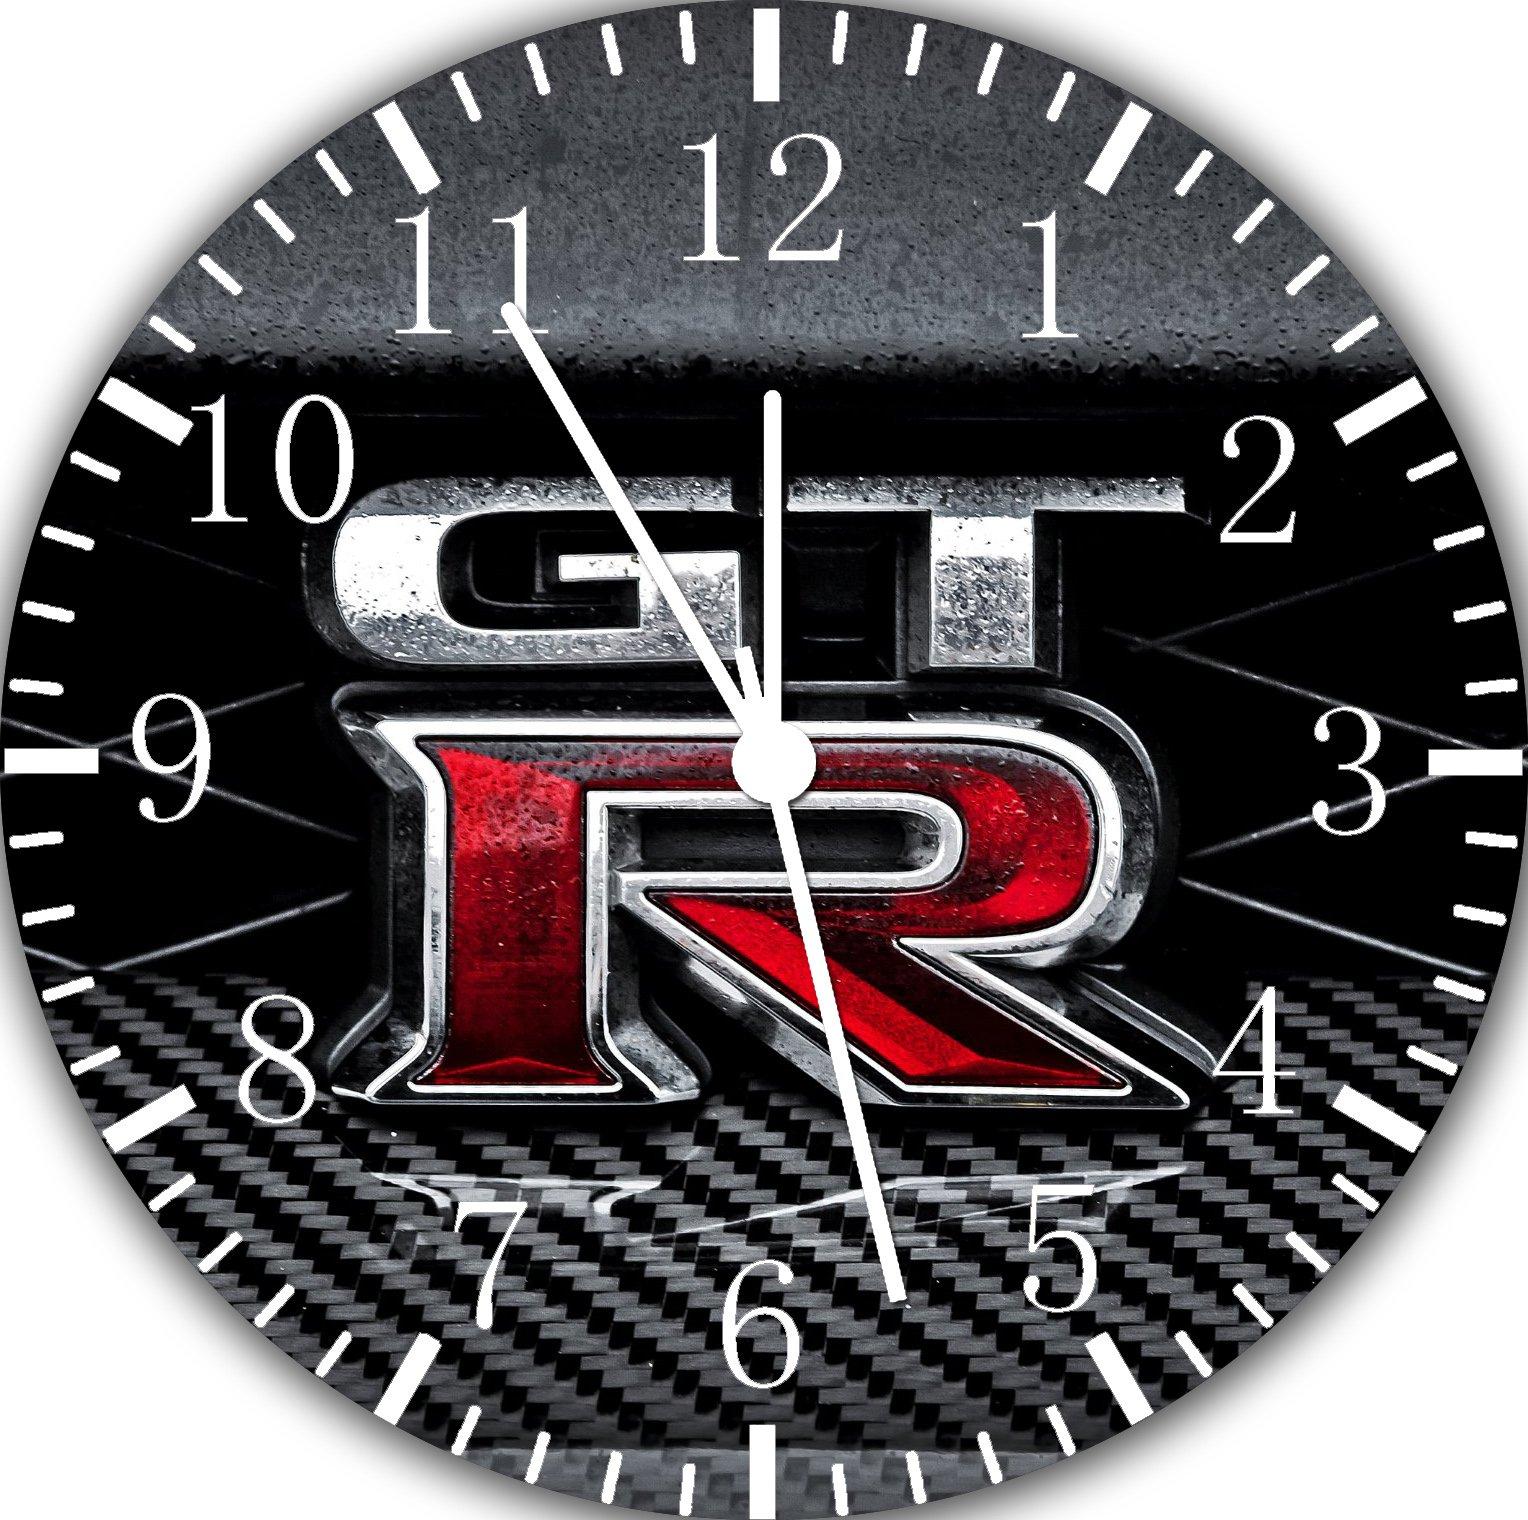 Nissan GTR Frameless Borderless Wall Clock F116 Nice For Gift or Room Wall Decor